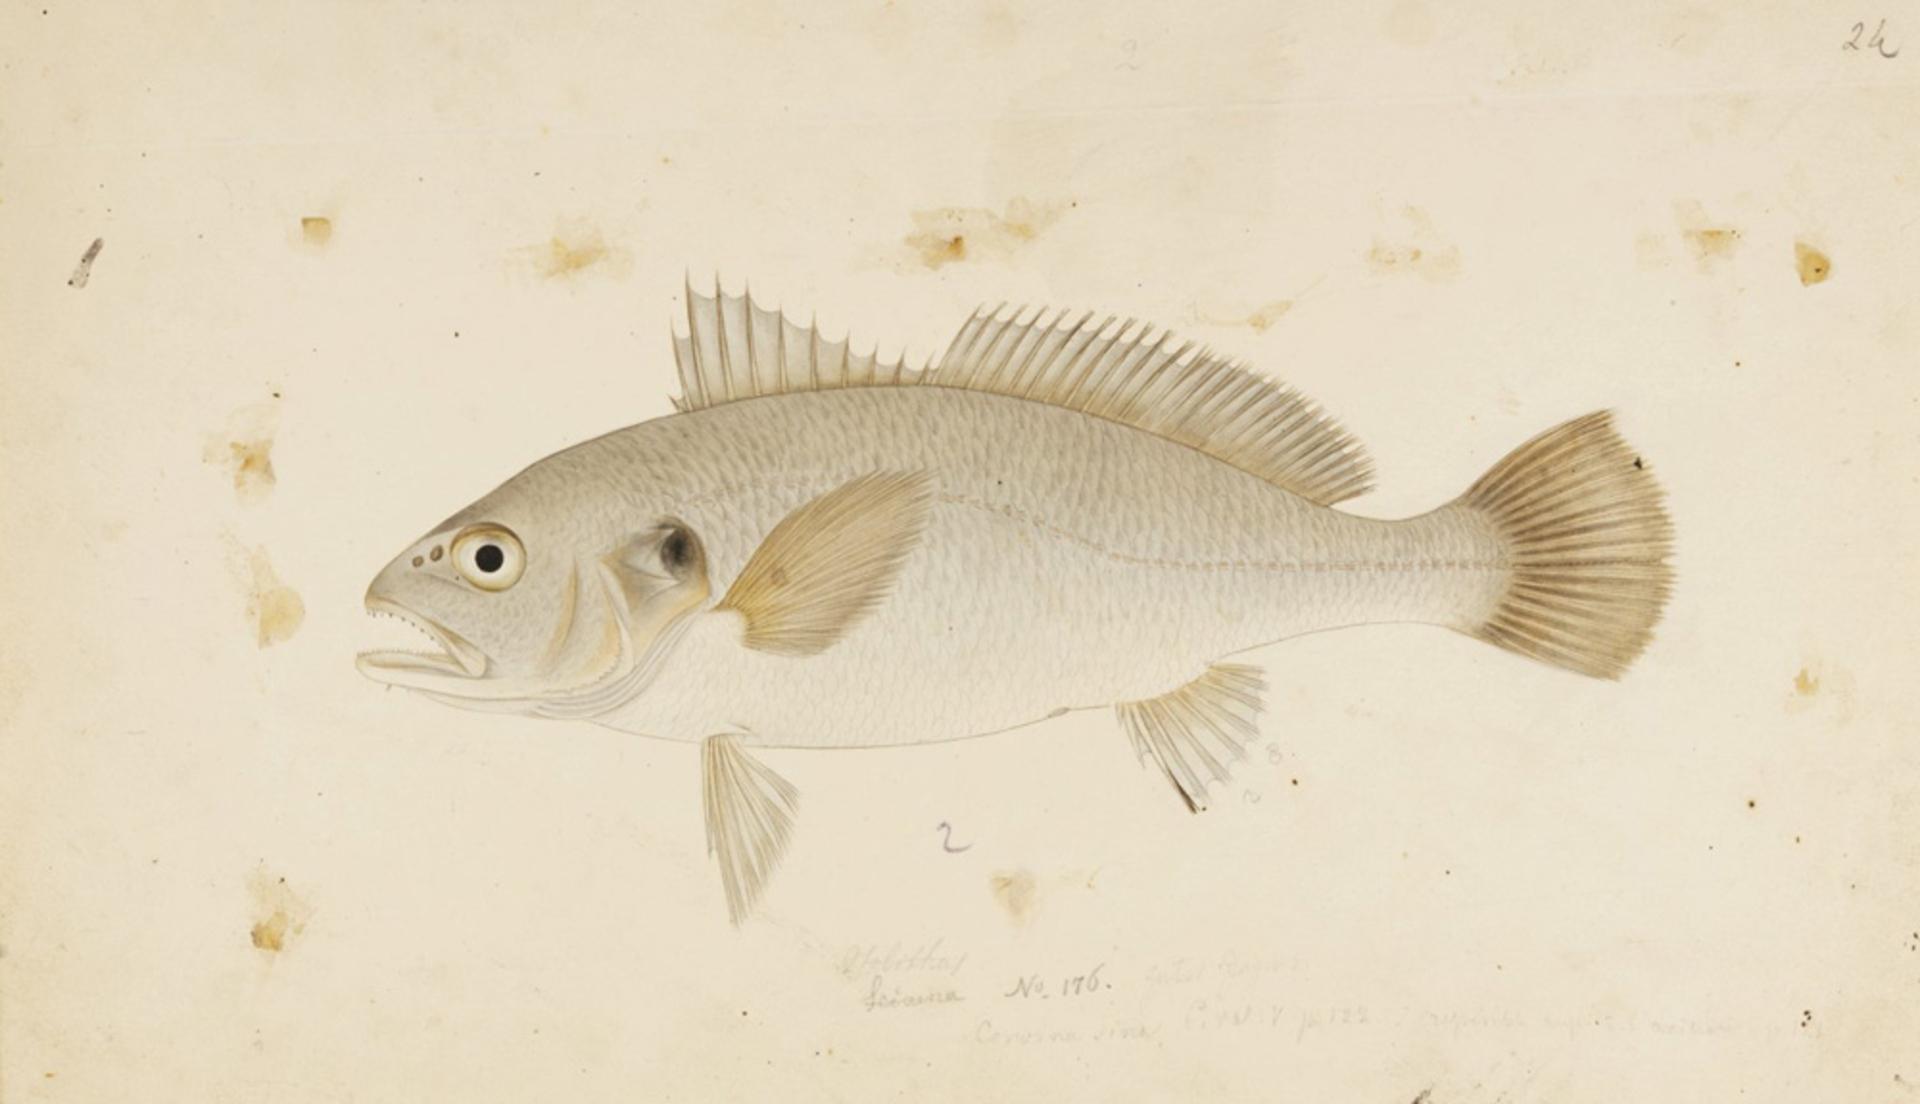 RMNH.ART.328 | Argyrosomus argentatus